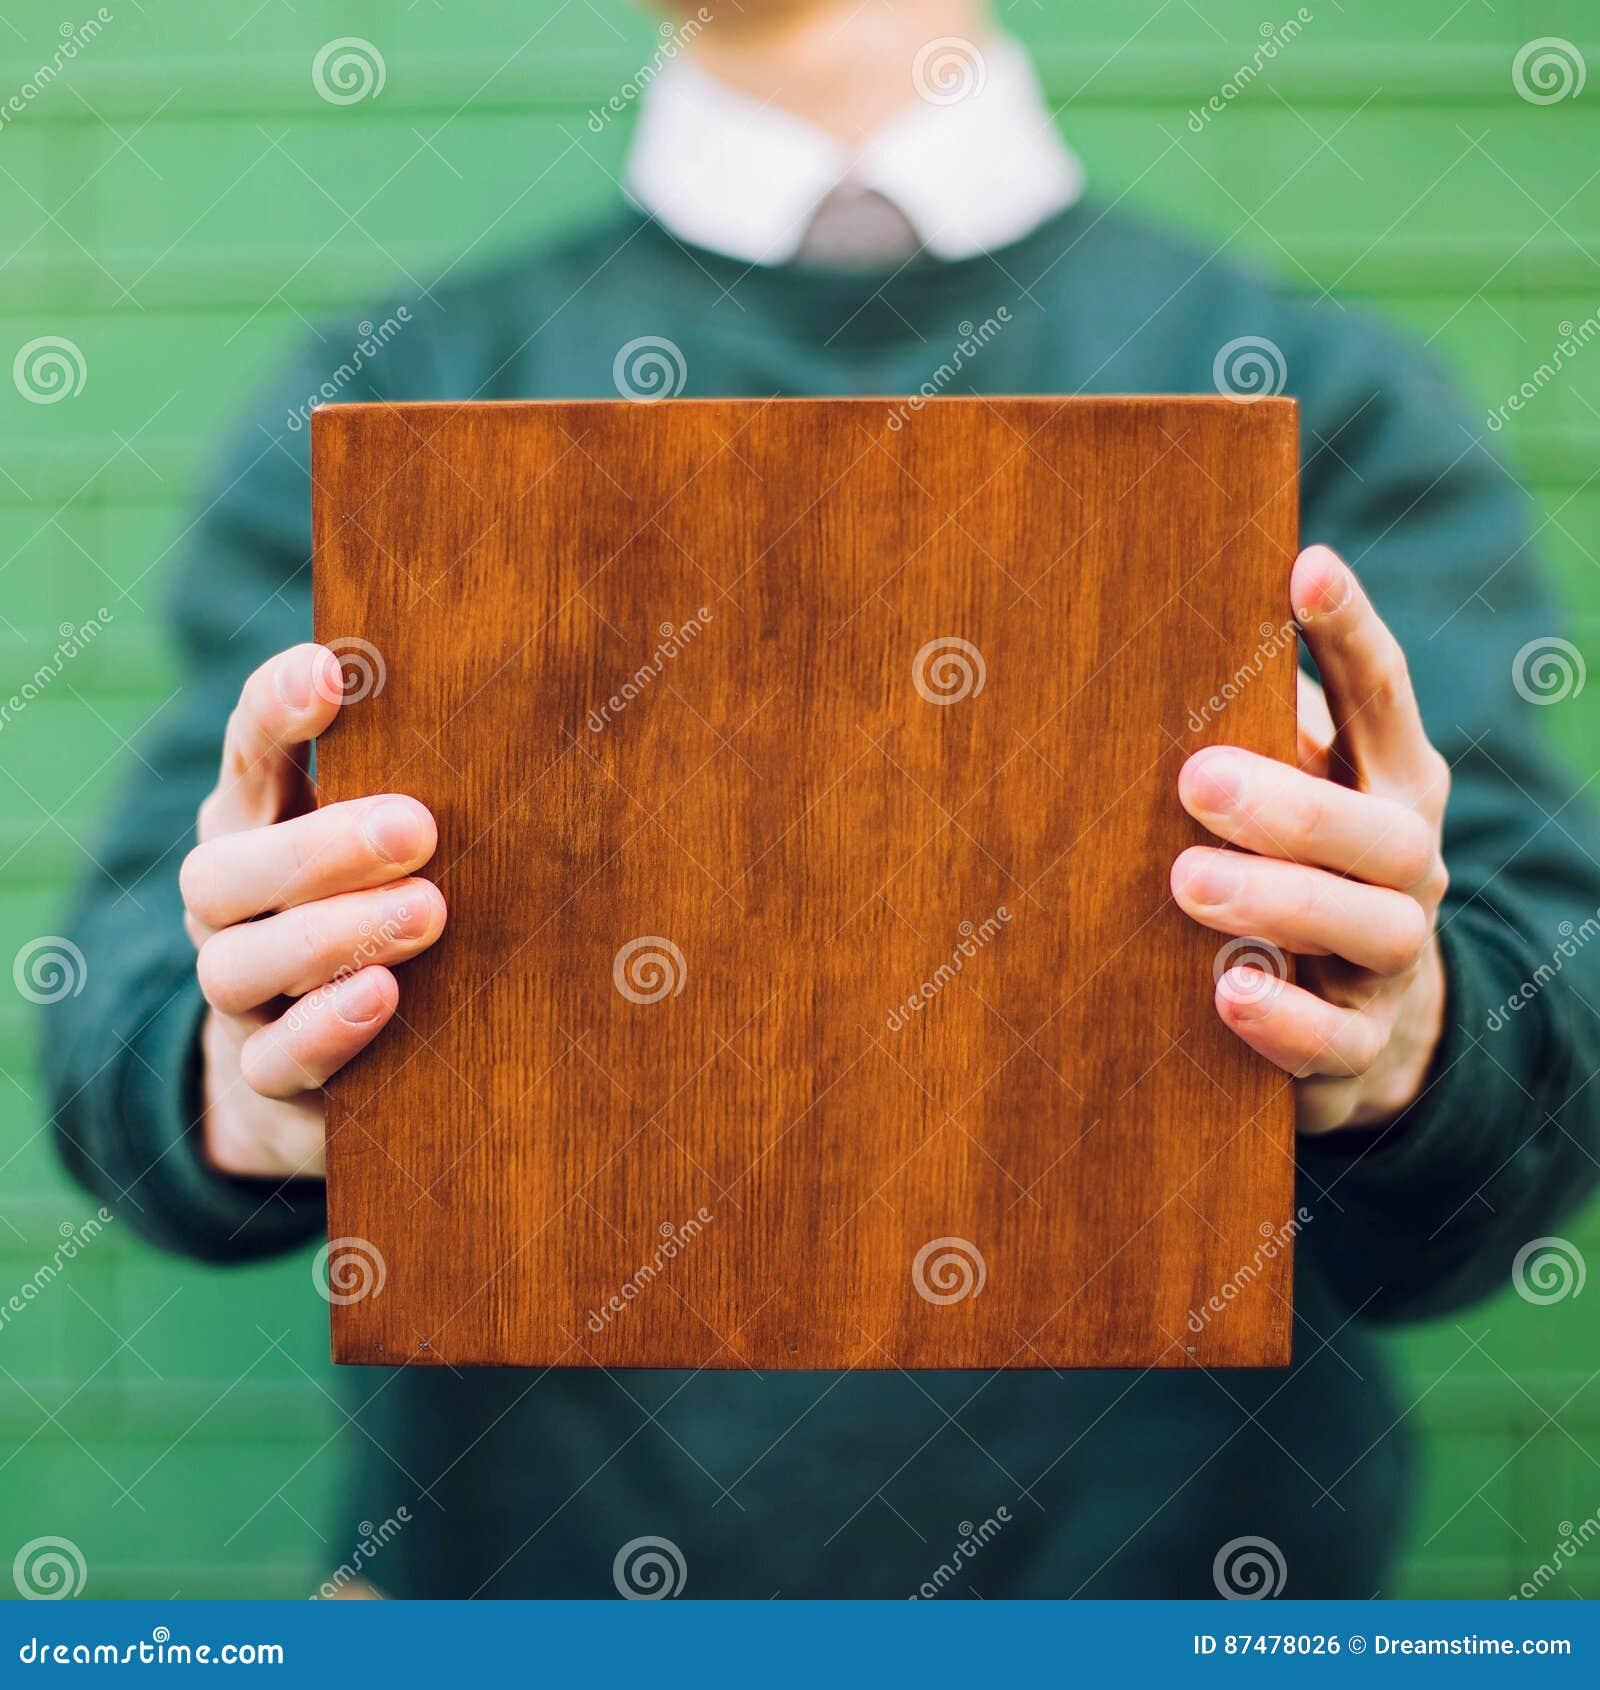 A man holding a wooden box